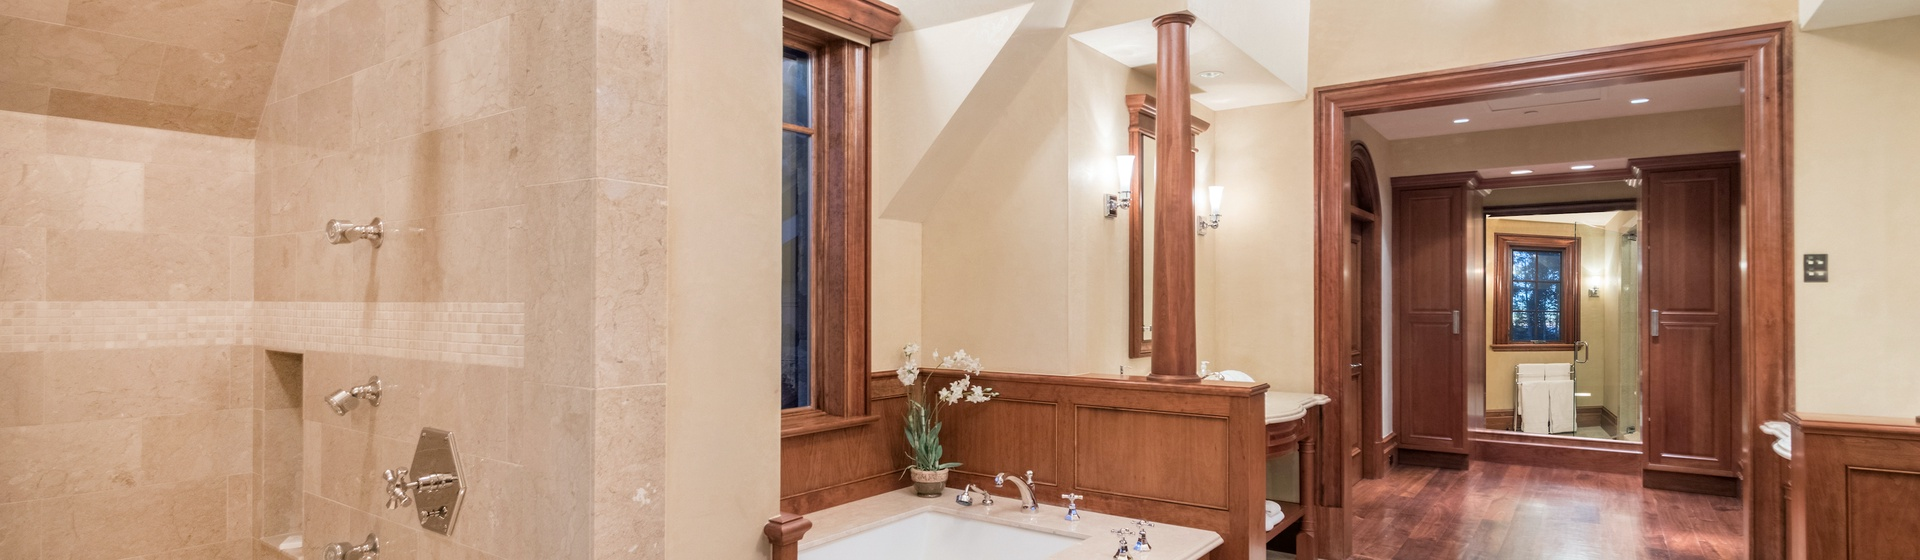 5.05-mountain-village-hood-park-manor-master-bedroom-a-bathroom-2-track.JPG